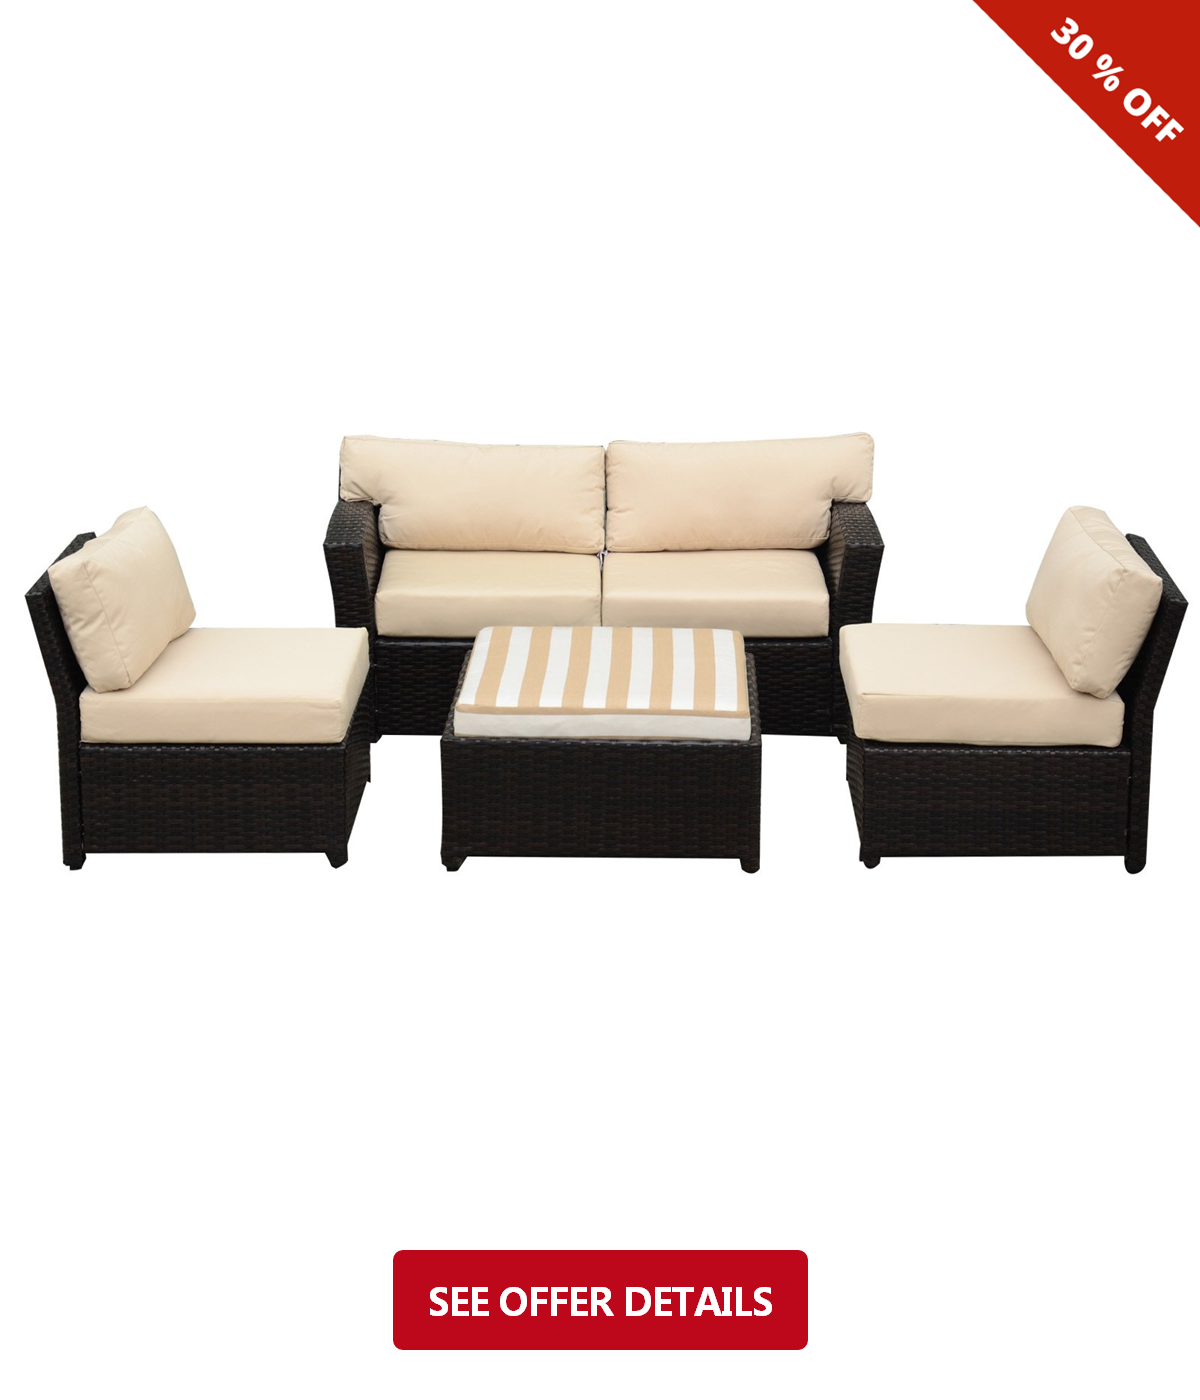 Fabulous 469 Caymus 5 Piece Rattan Wicker Sectional Sofa Set Creativecarmelina Interior Chair Design Creativecarmelinacom